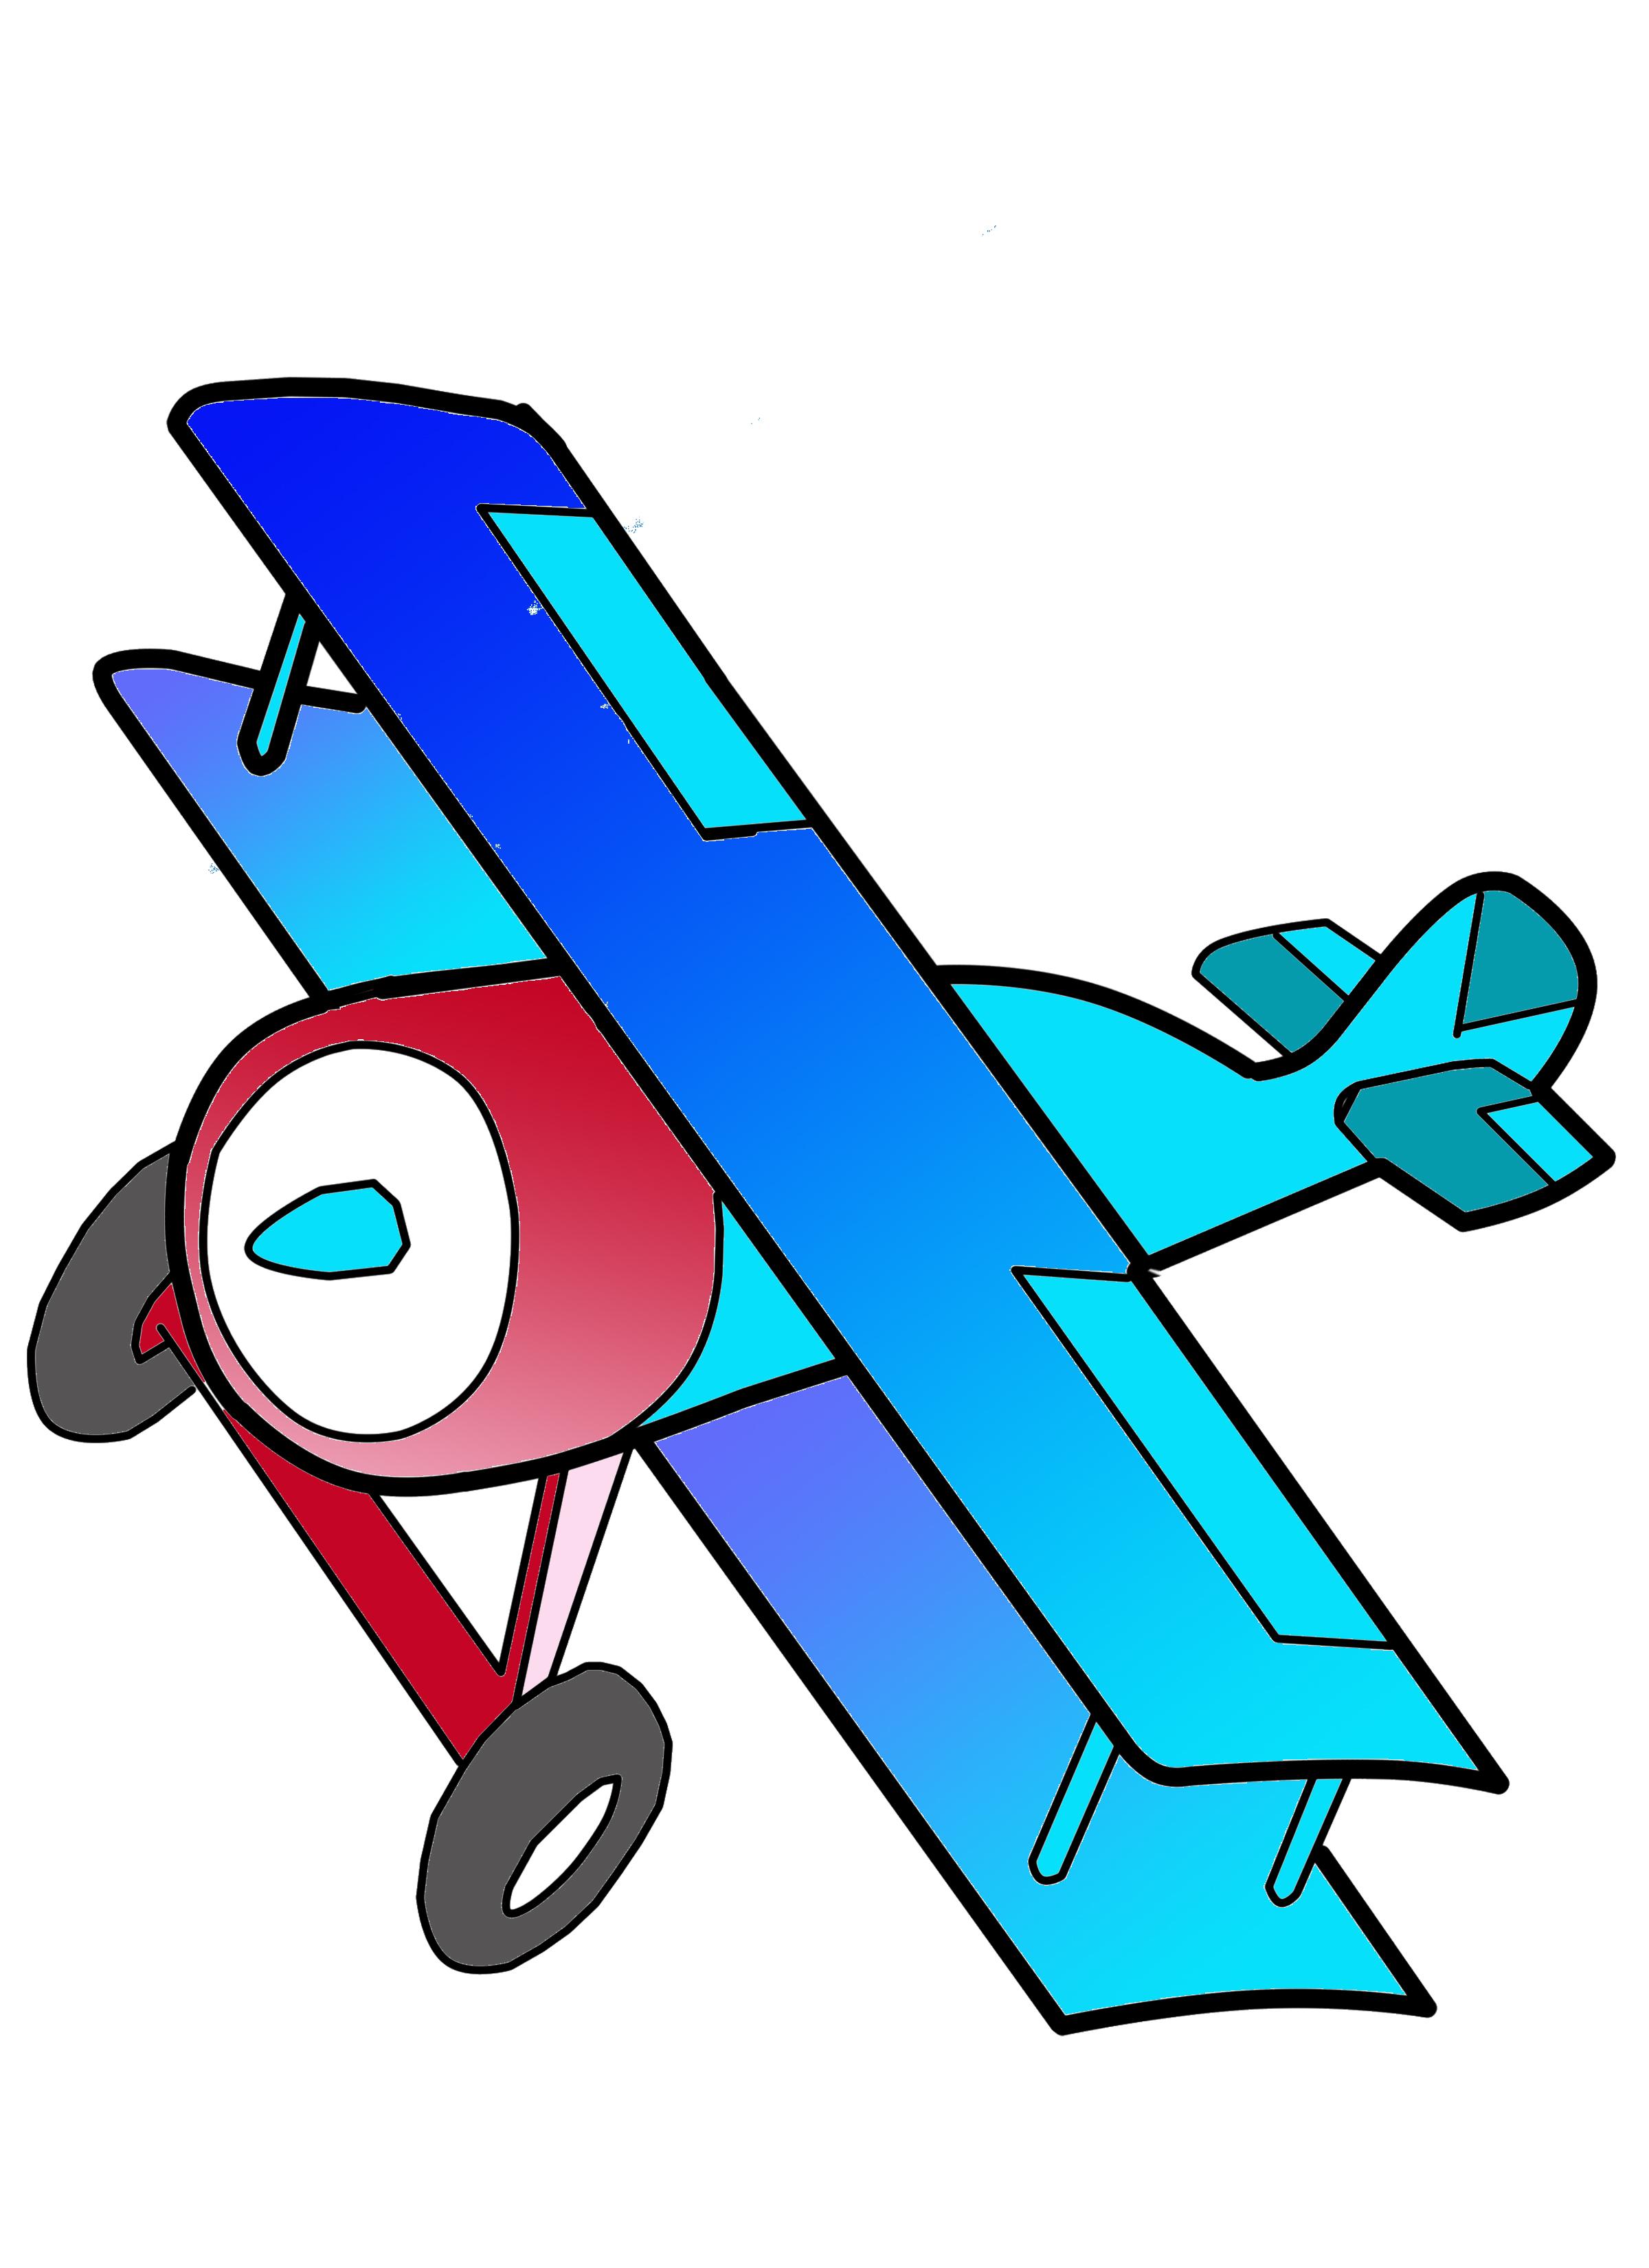 Clip Art Biplane Clipart biplane clipart kid free images at clker com vector clip art online royalty